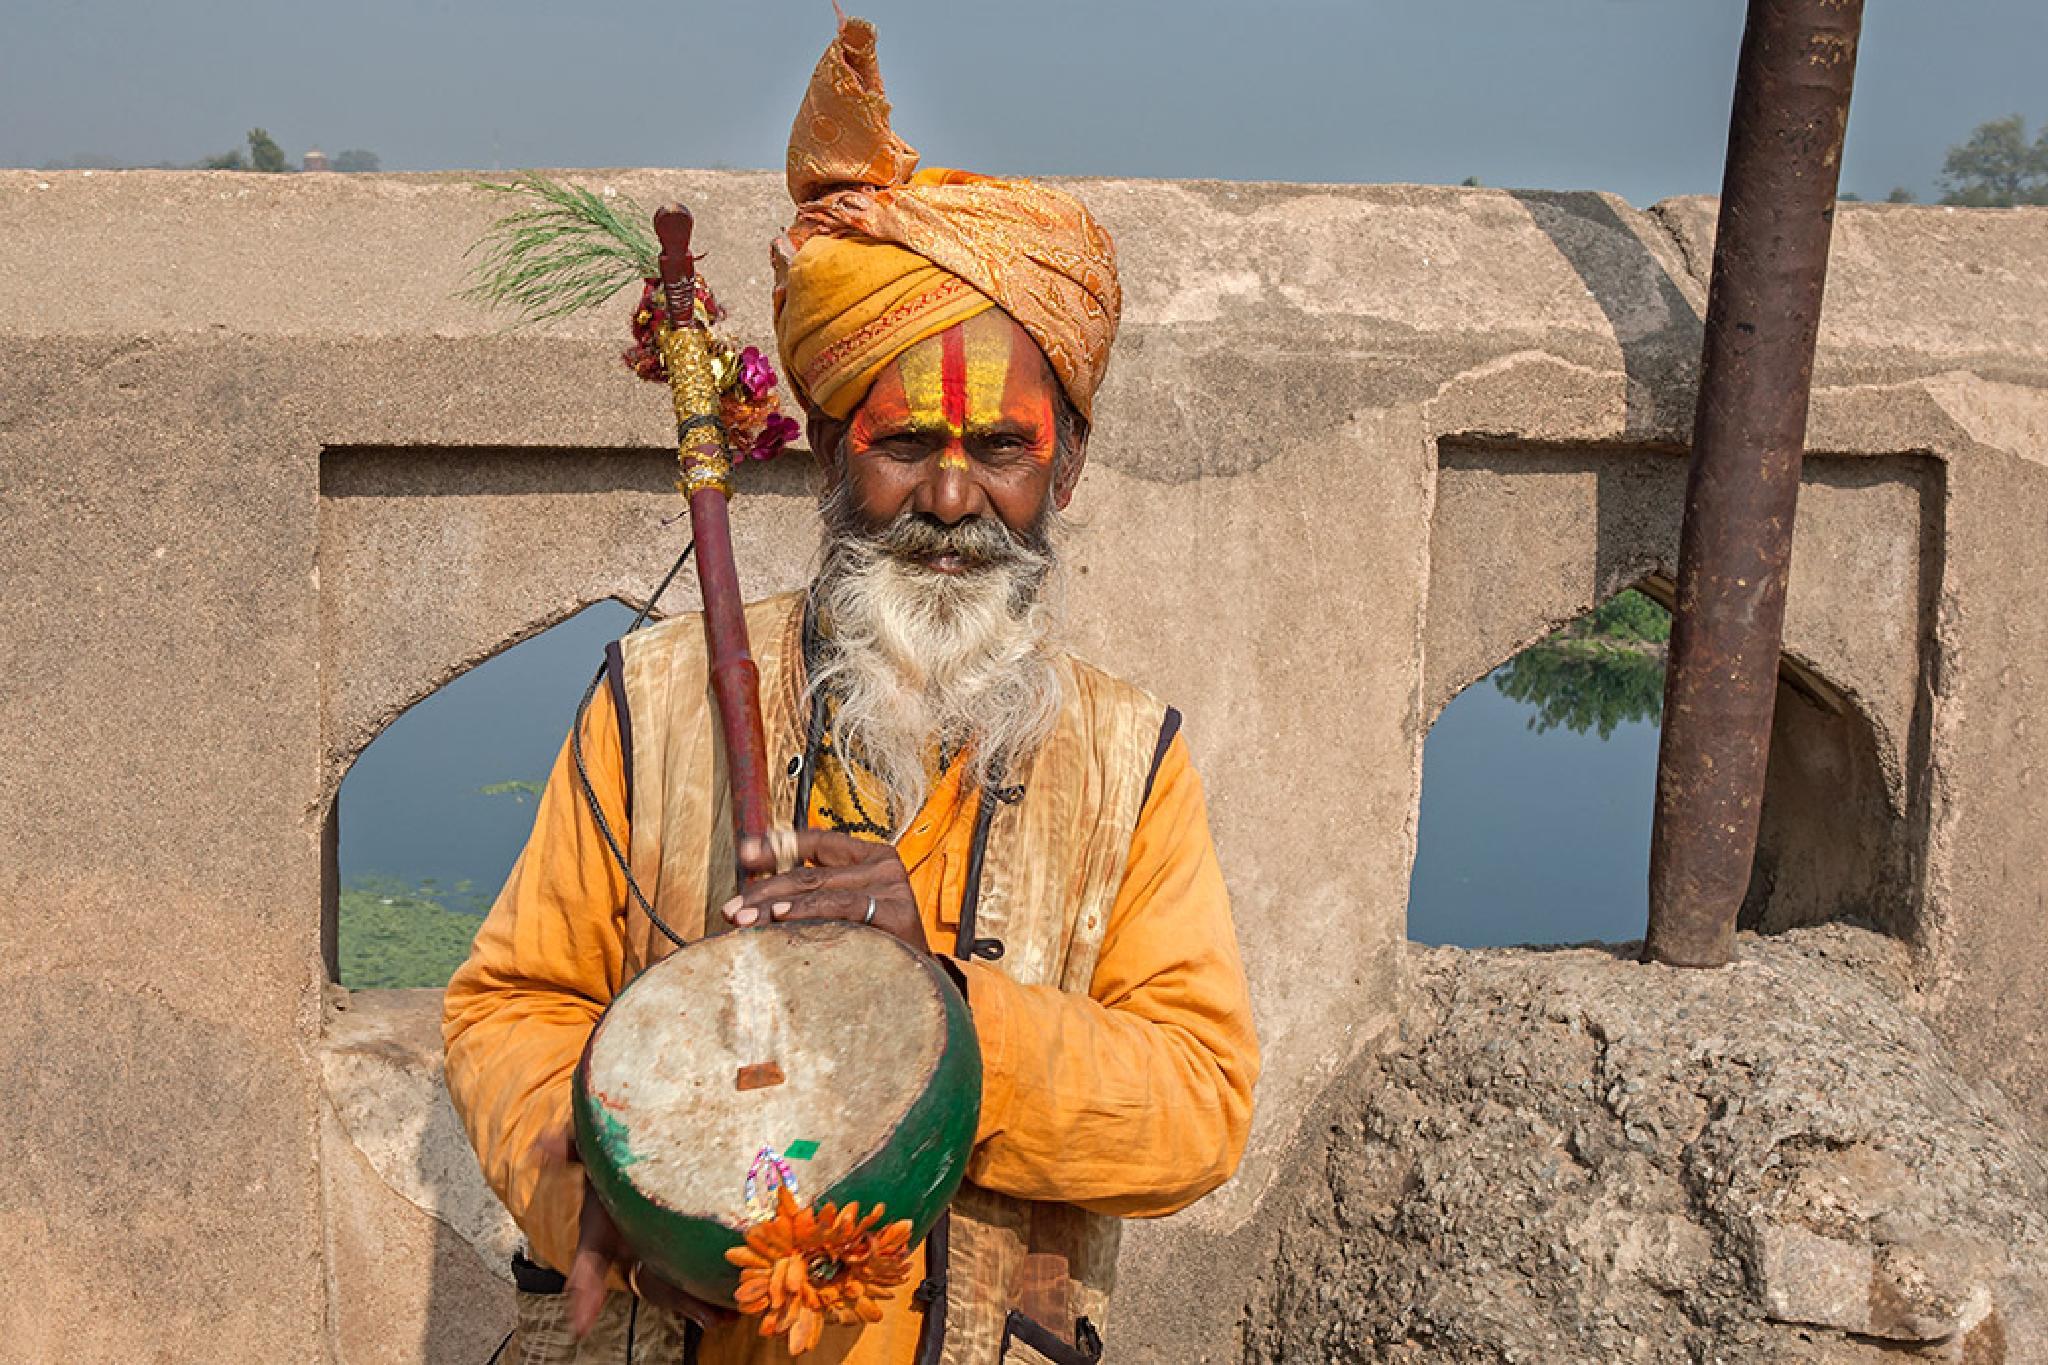 Holy Man, Jaipur, India by Sotiris Siomis